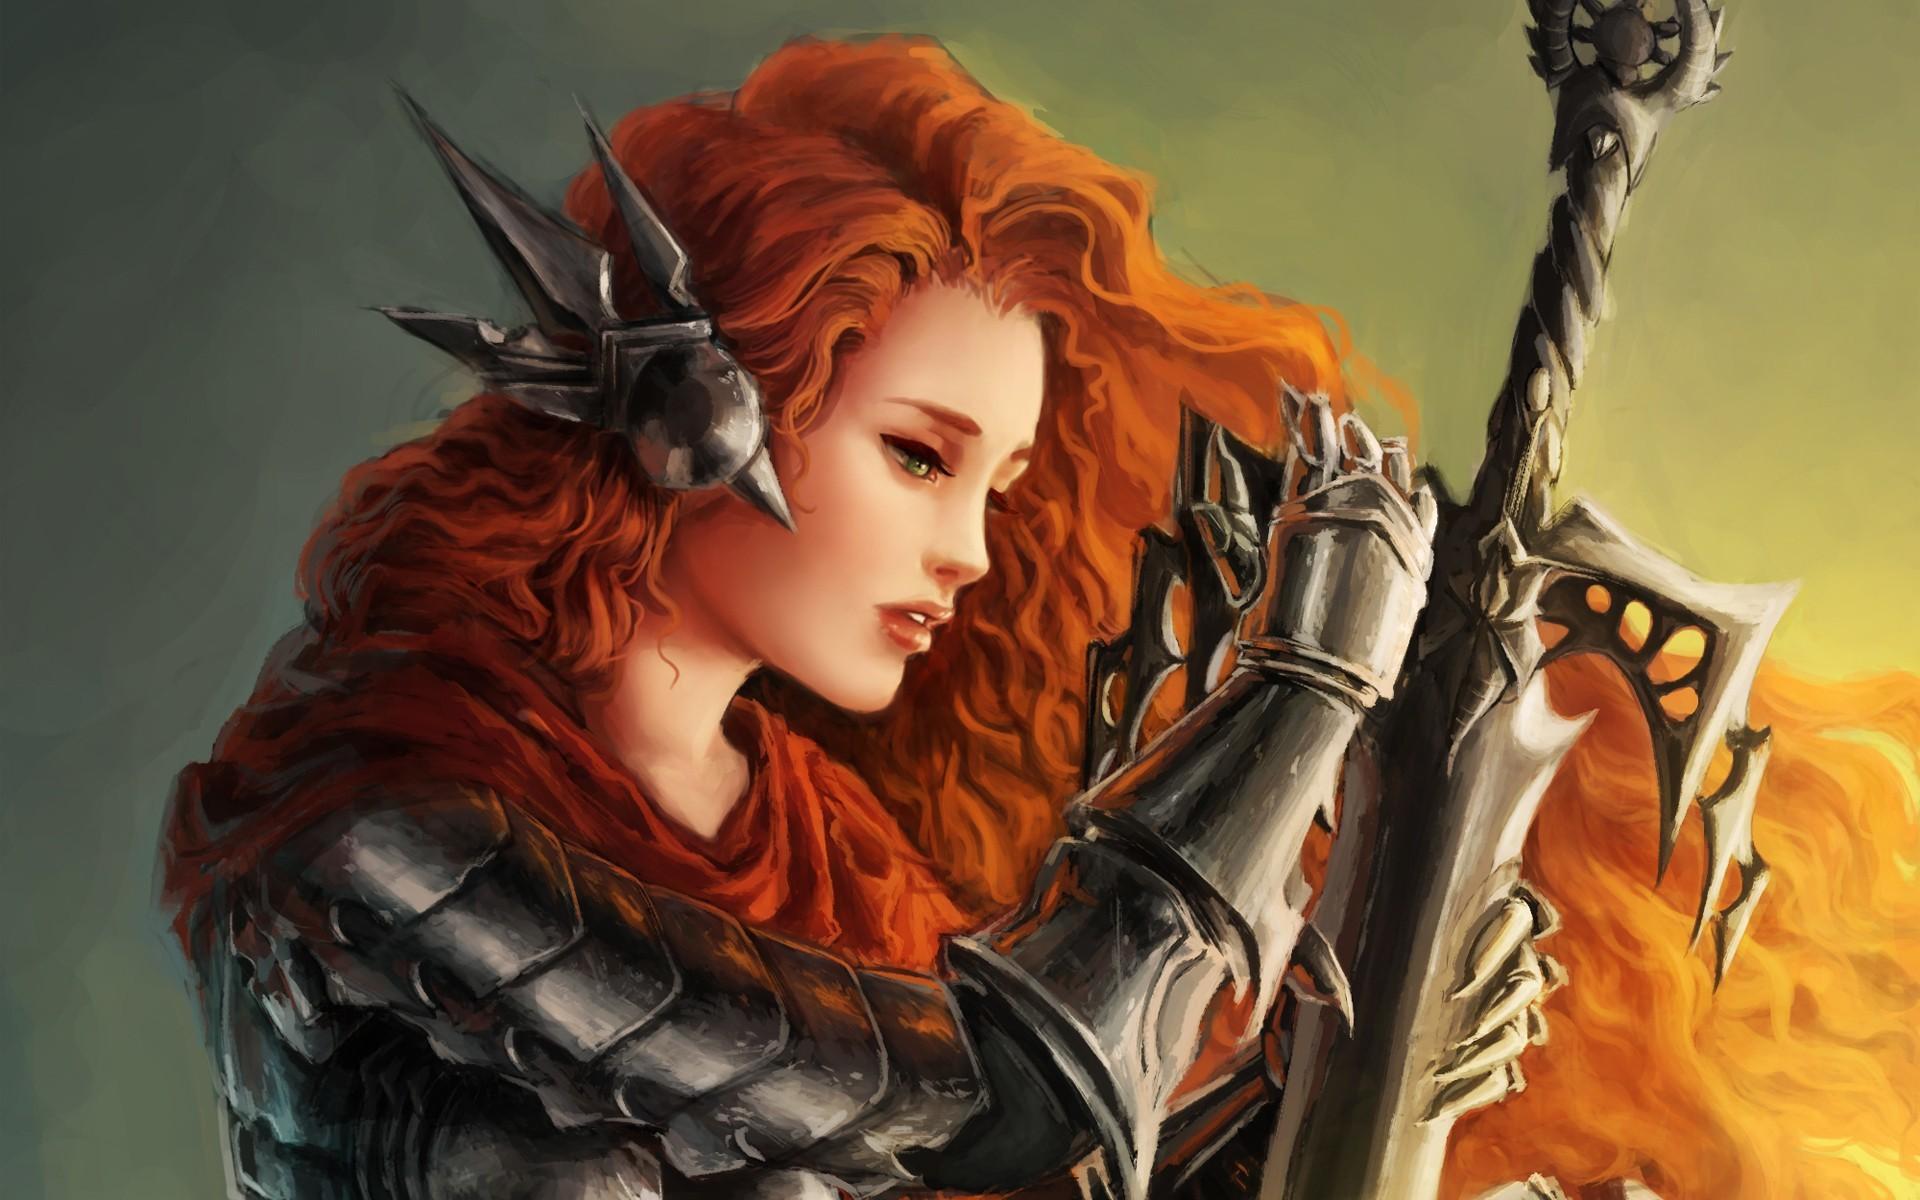 Women fantasy art armor artwork warriors orange hair swords wallpaper      55628   WallpaperUP